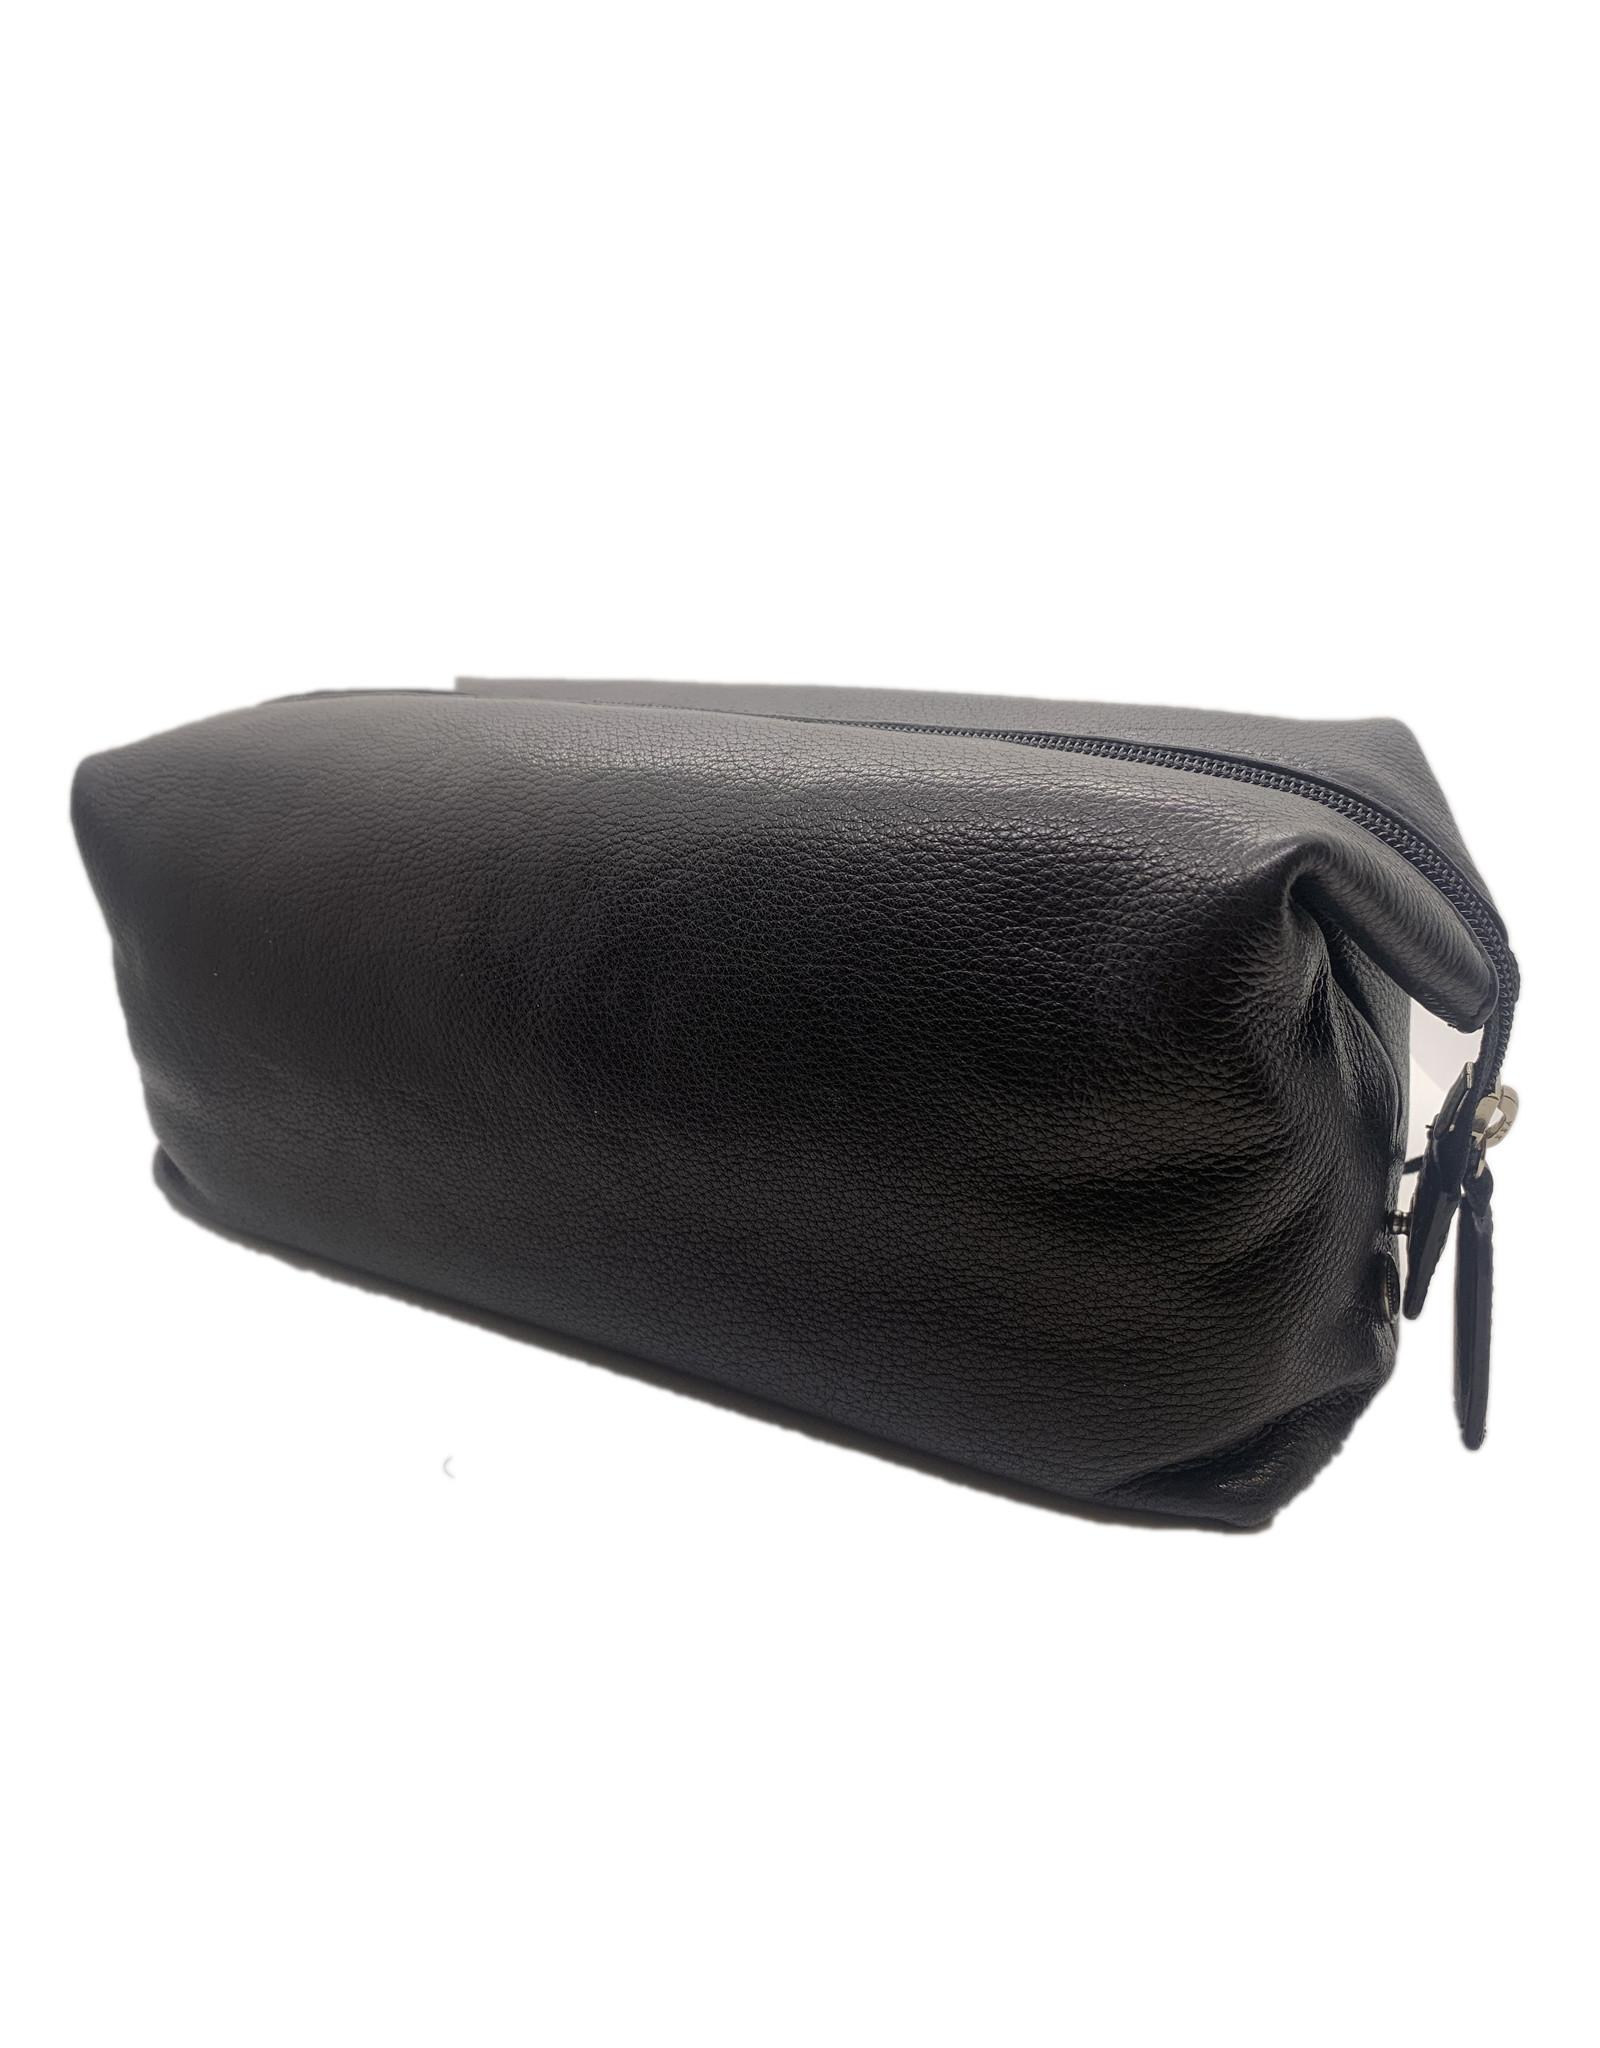 Black Leather Travel Kit Black